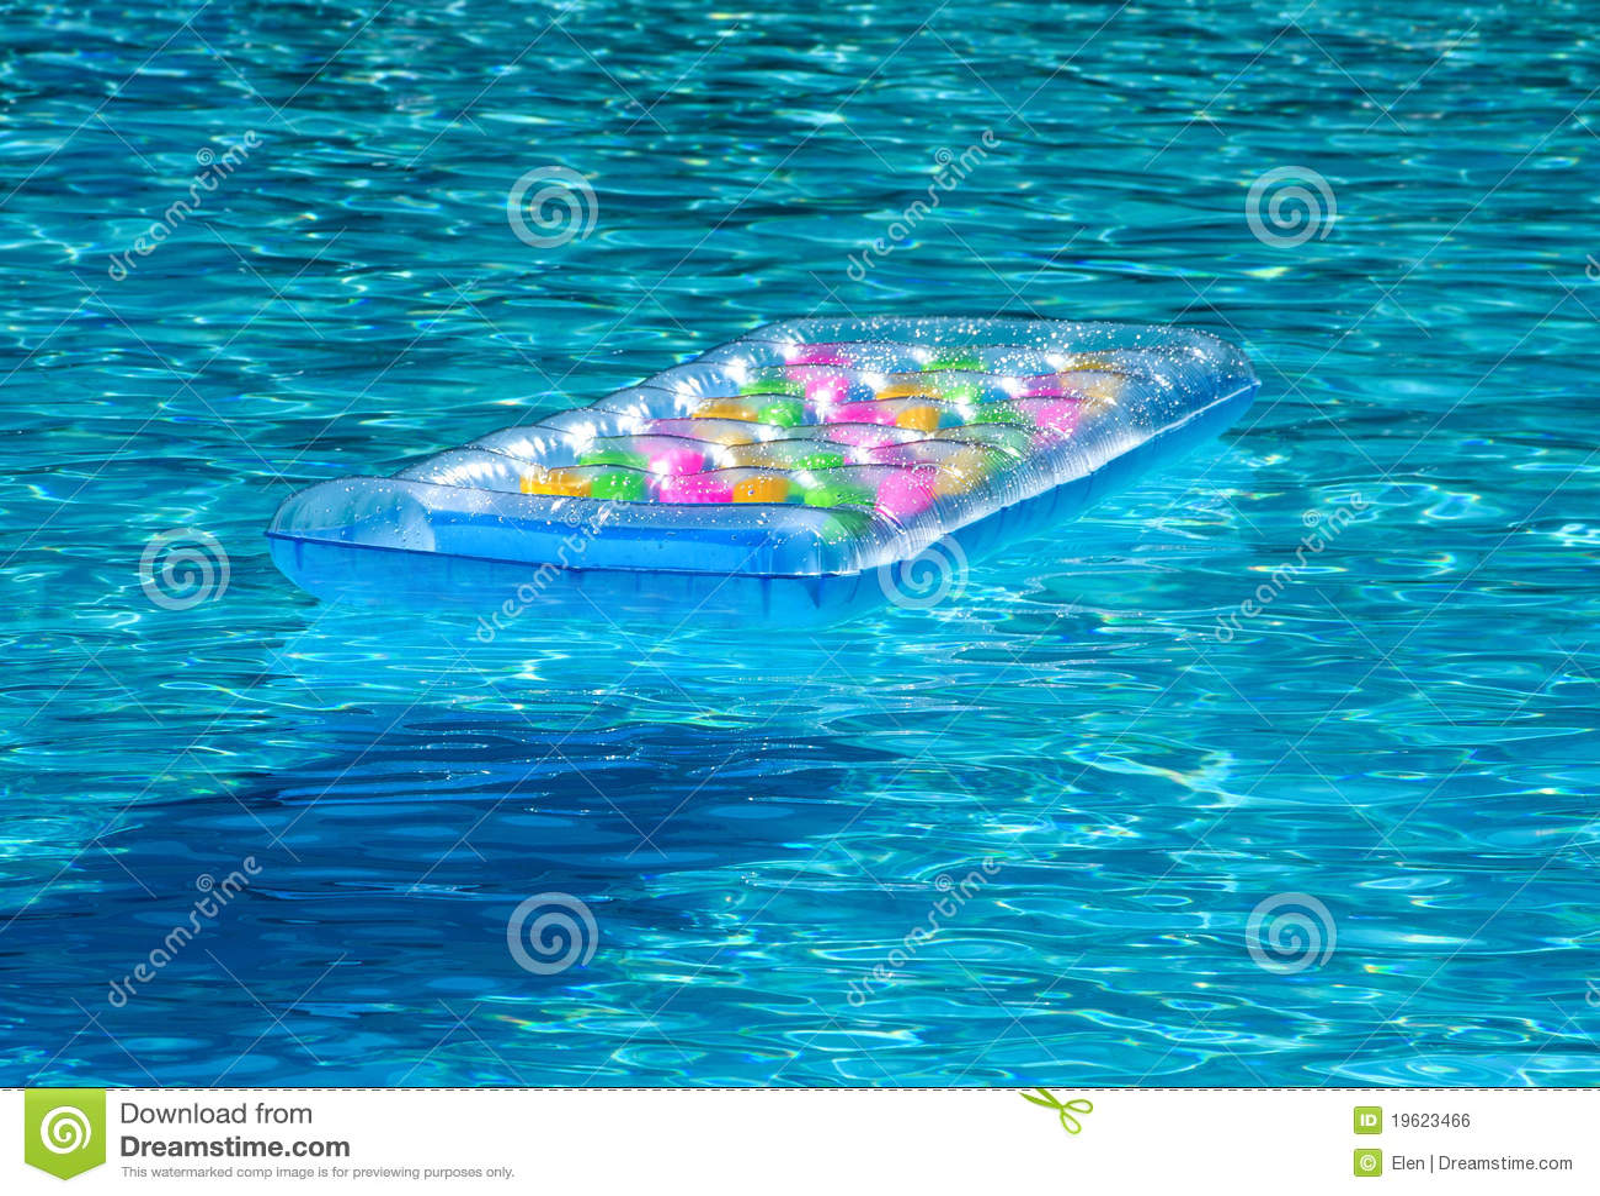 Aufblasbare matratze im pool lizenzfreies stockbild bild for Aufblasbare pools im angebot